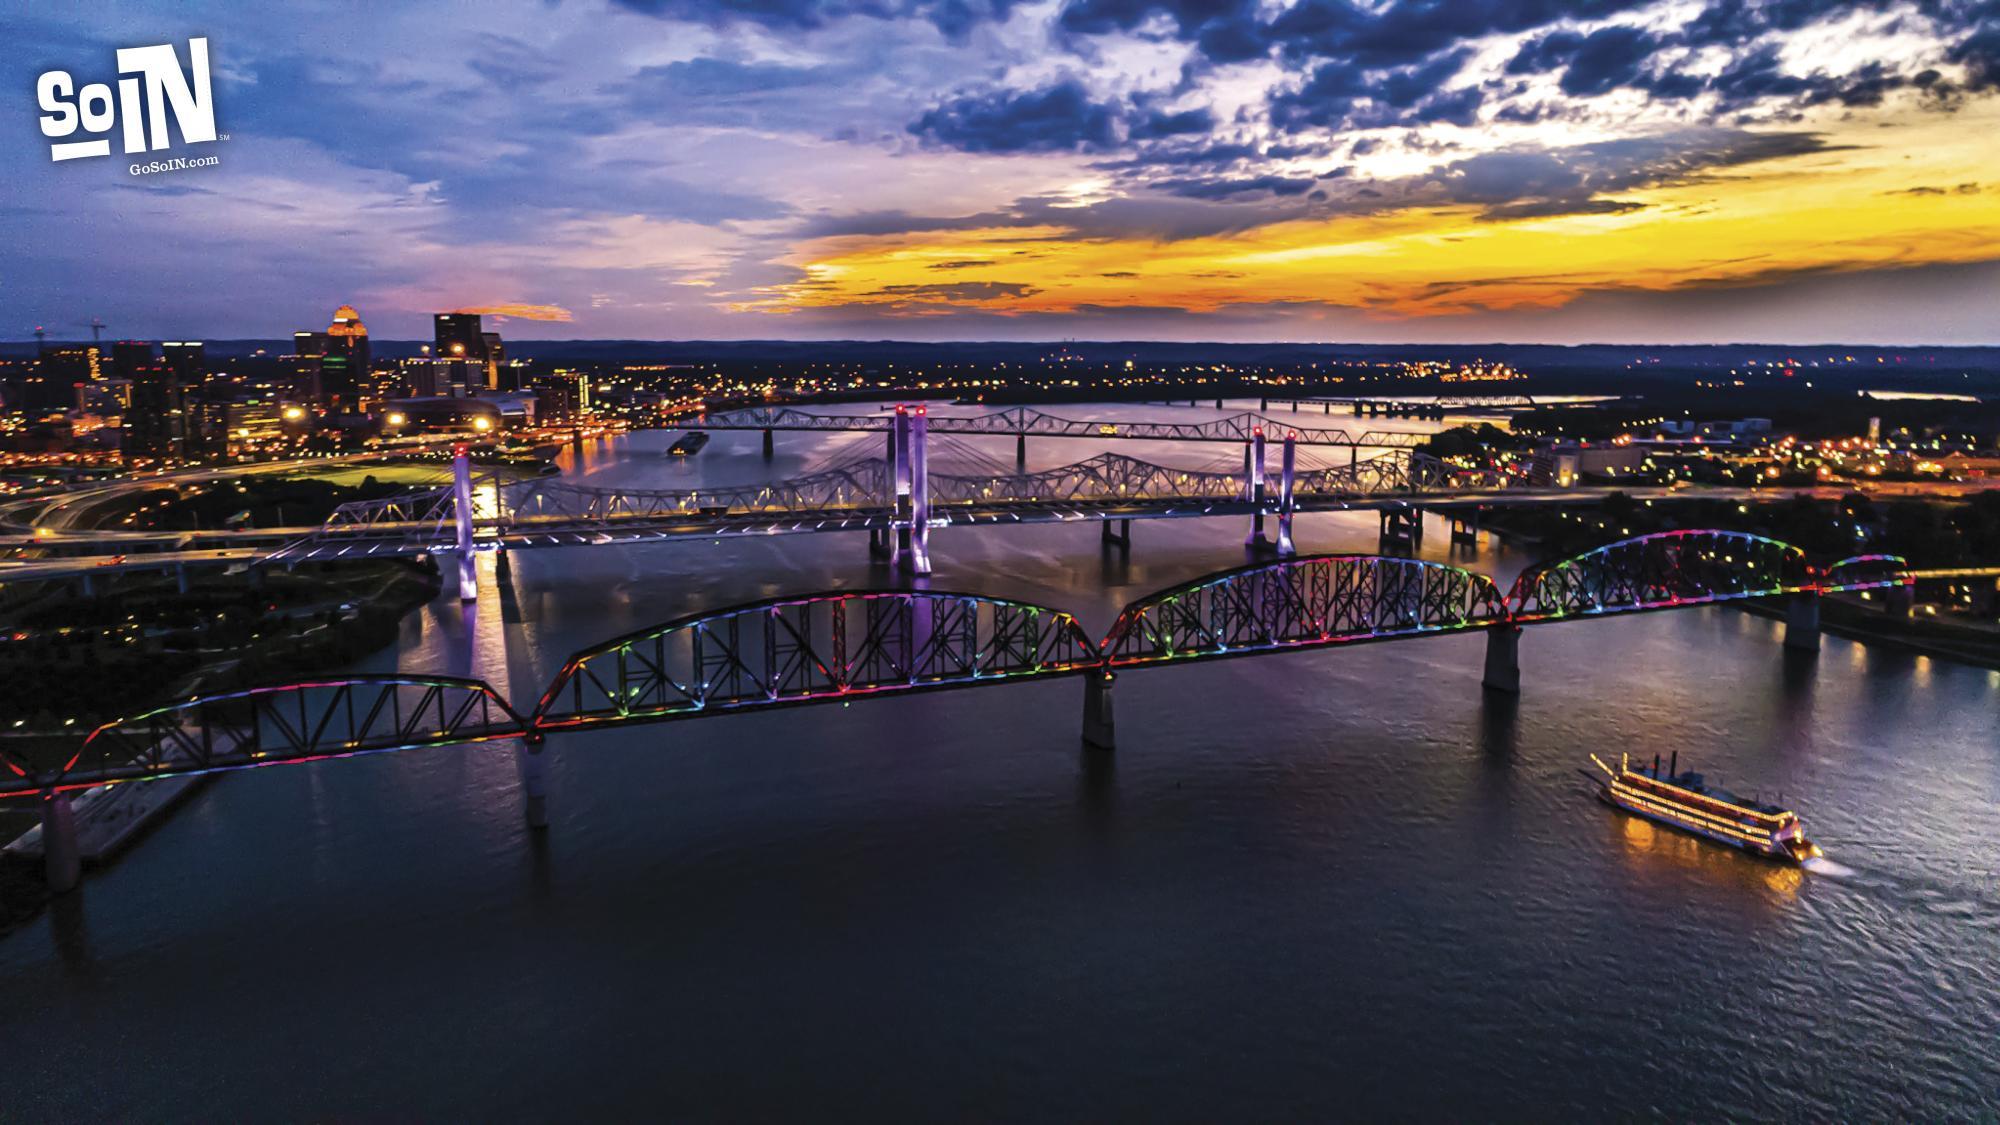 SoIN Virtual Background 1 - Ohio River Bridges